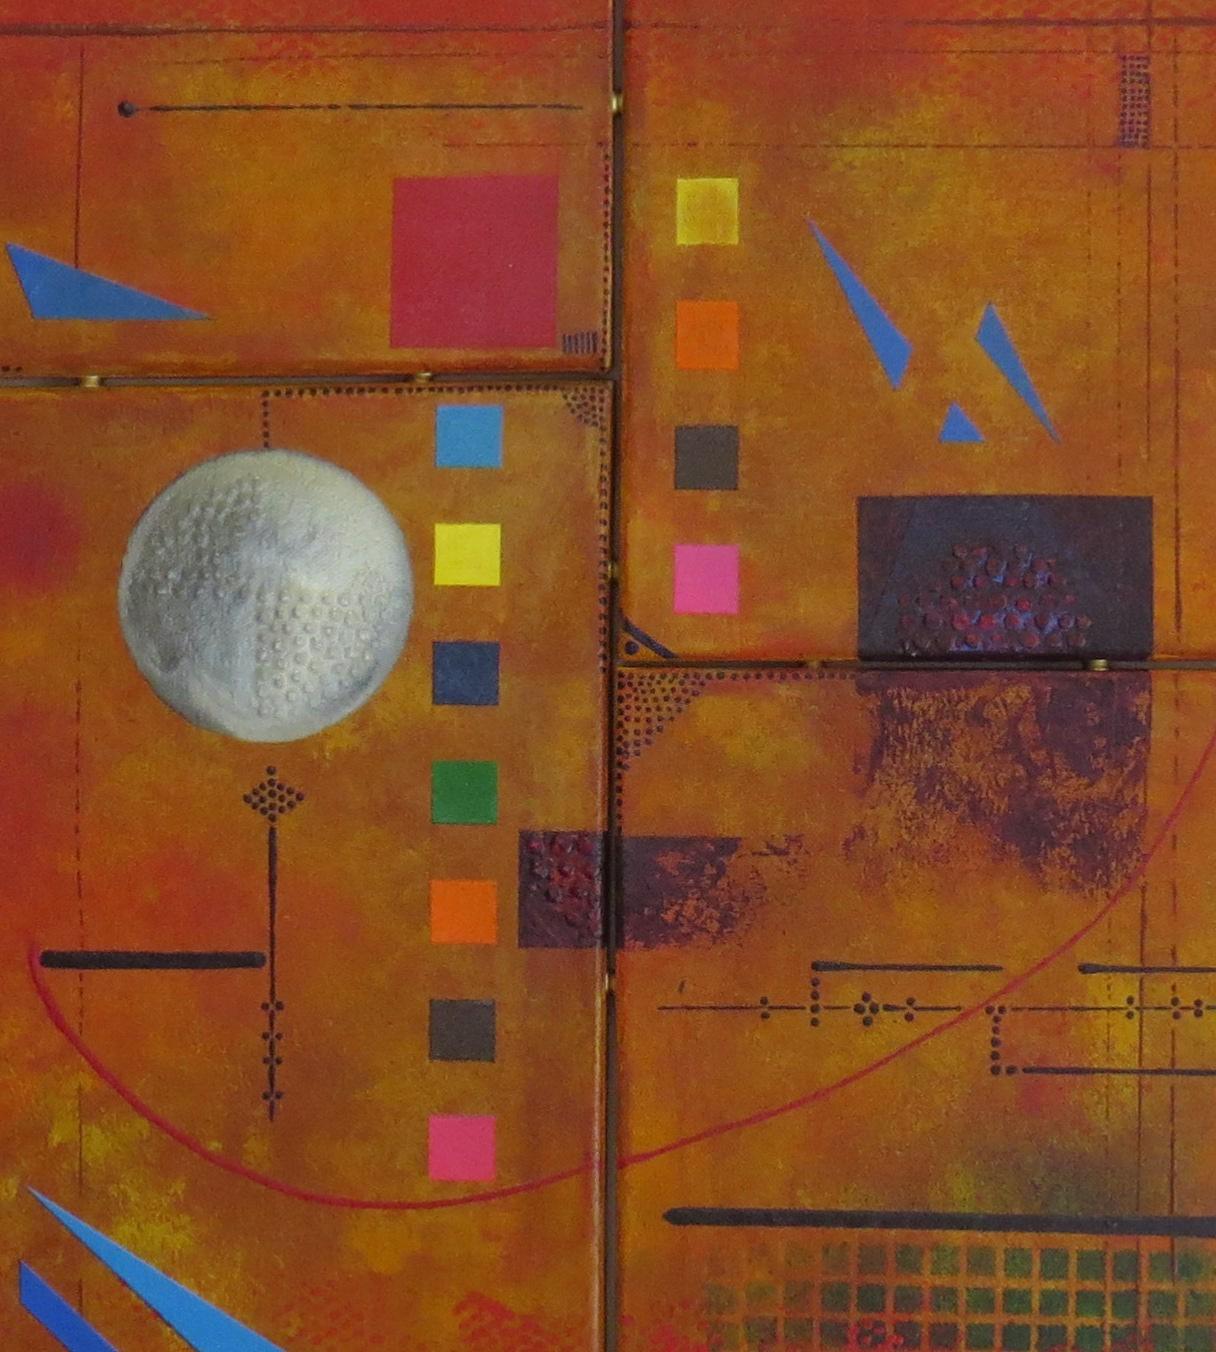 sigma - zoom4 - DALUZ GALEGO - peinture abstraite